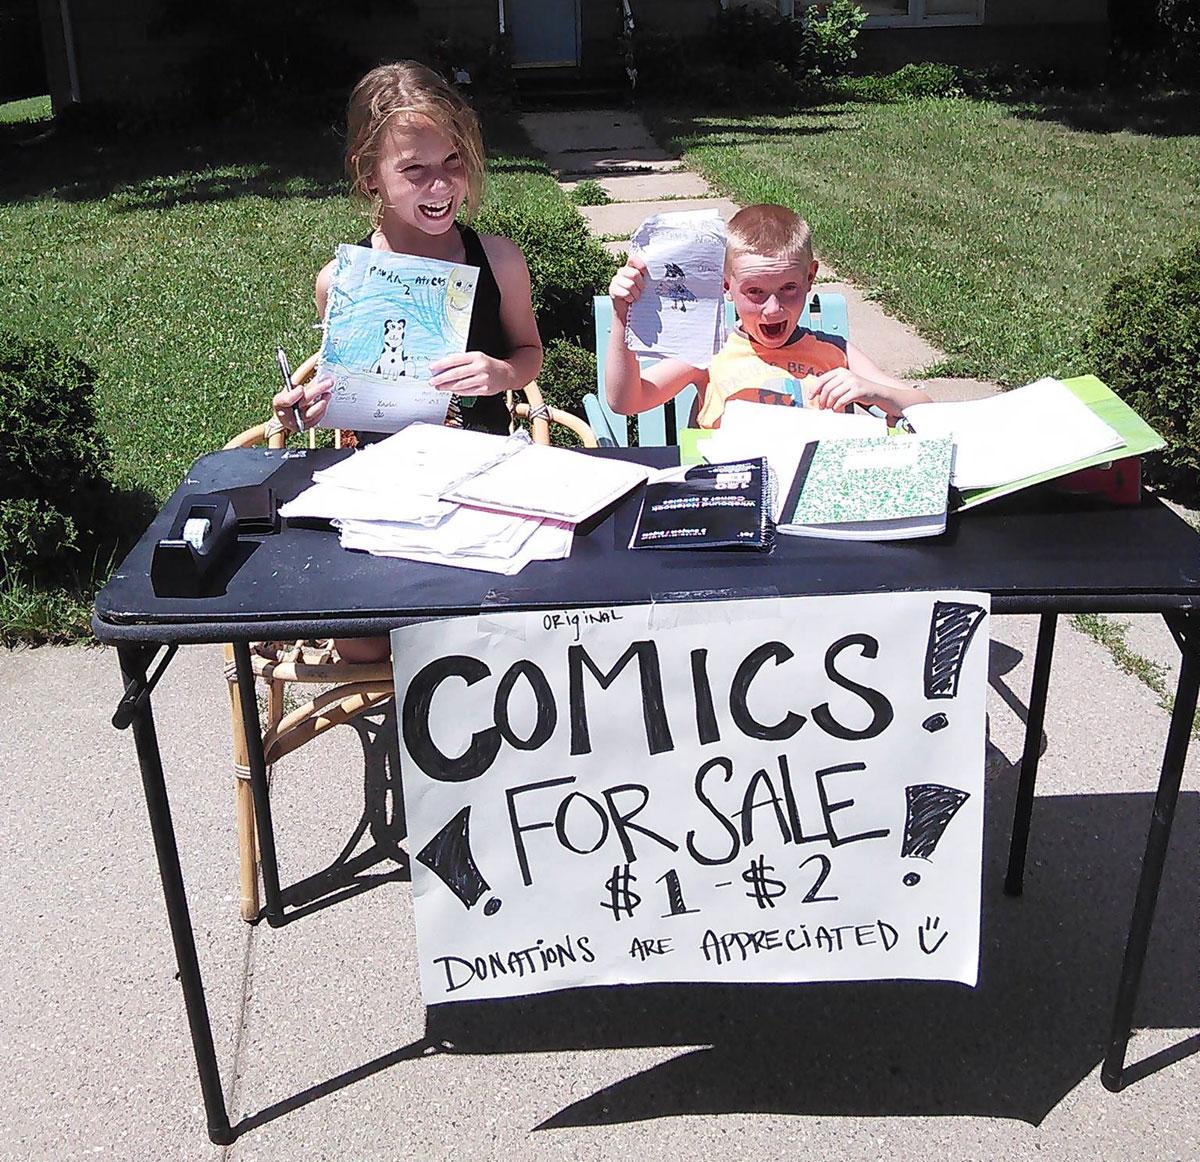 Kids' comic book stand